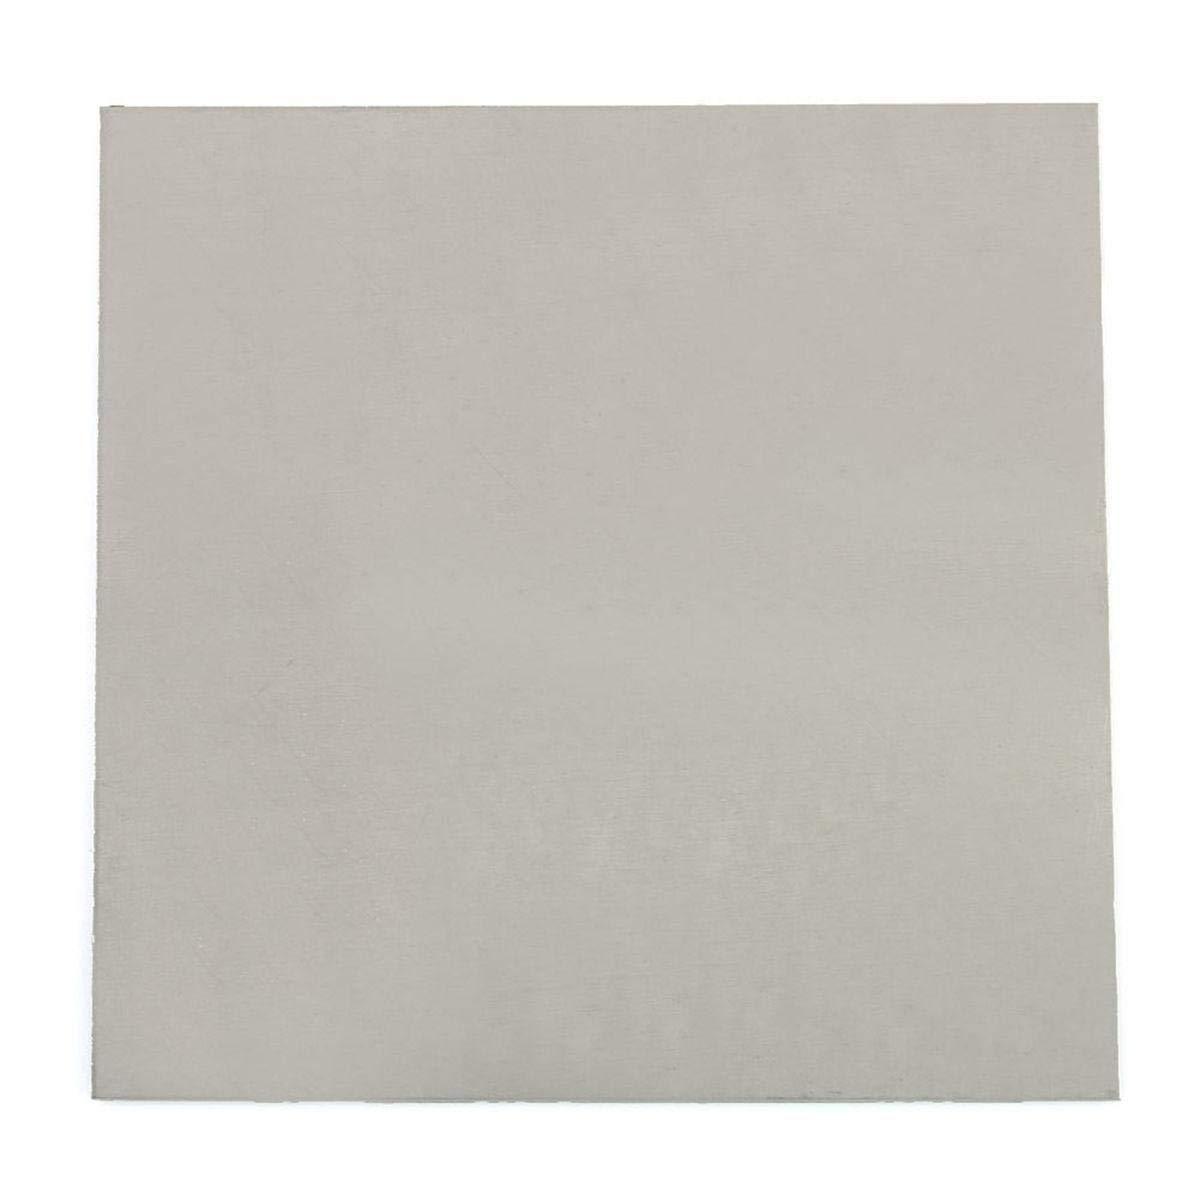 Titanium Ti Gr2 Grade 2 ASTM B265 Thin Plate Sheet Foil 0.1x200x300 mm